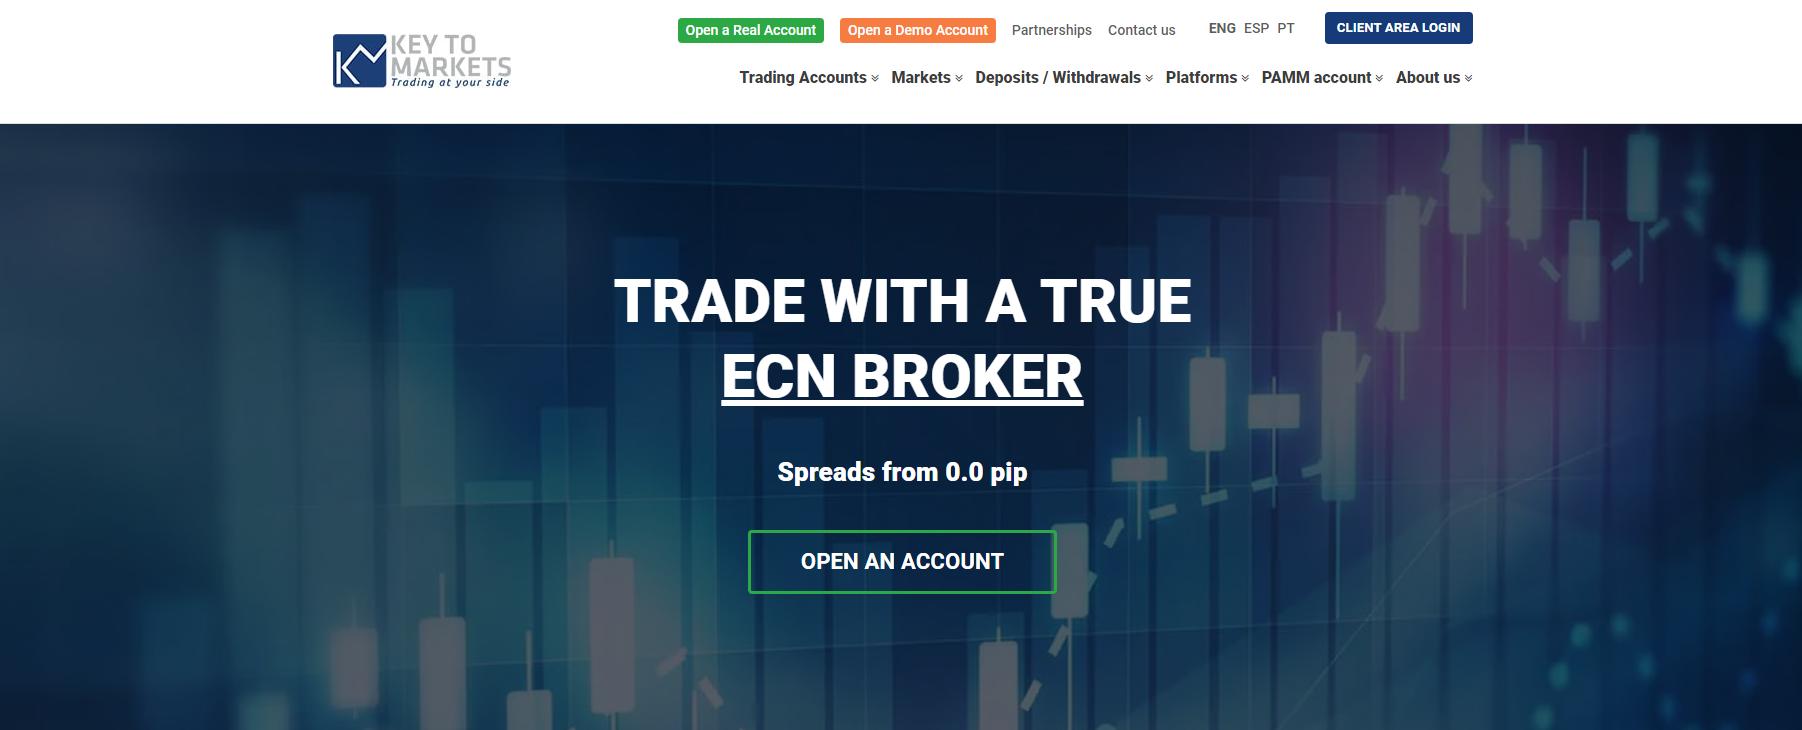 key to markets официальный сайт